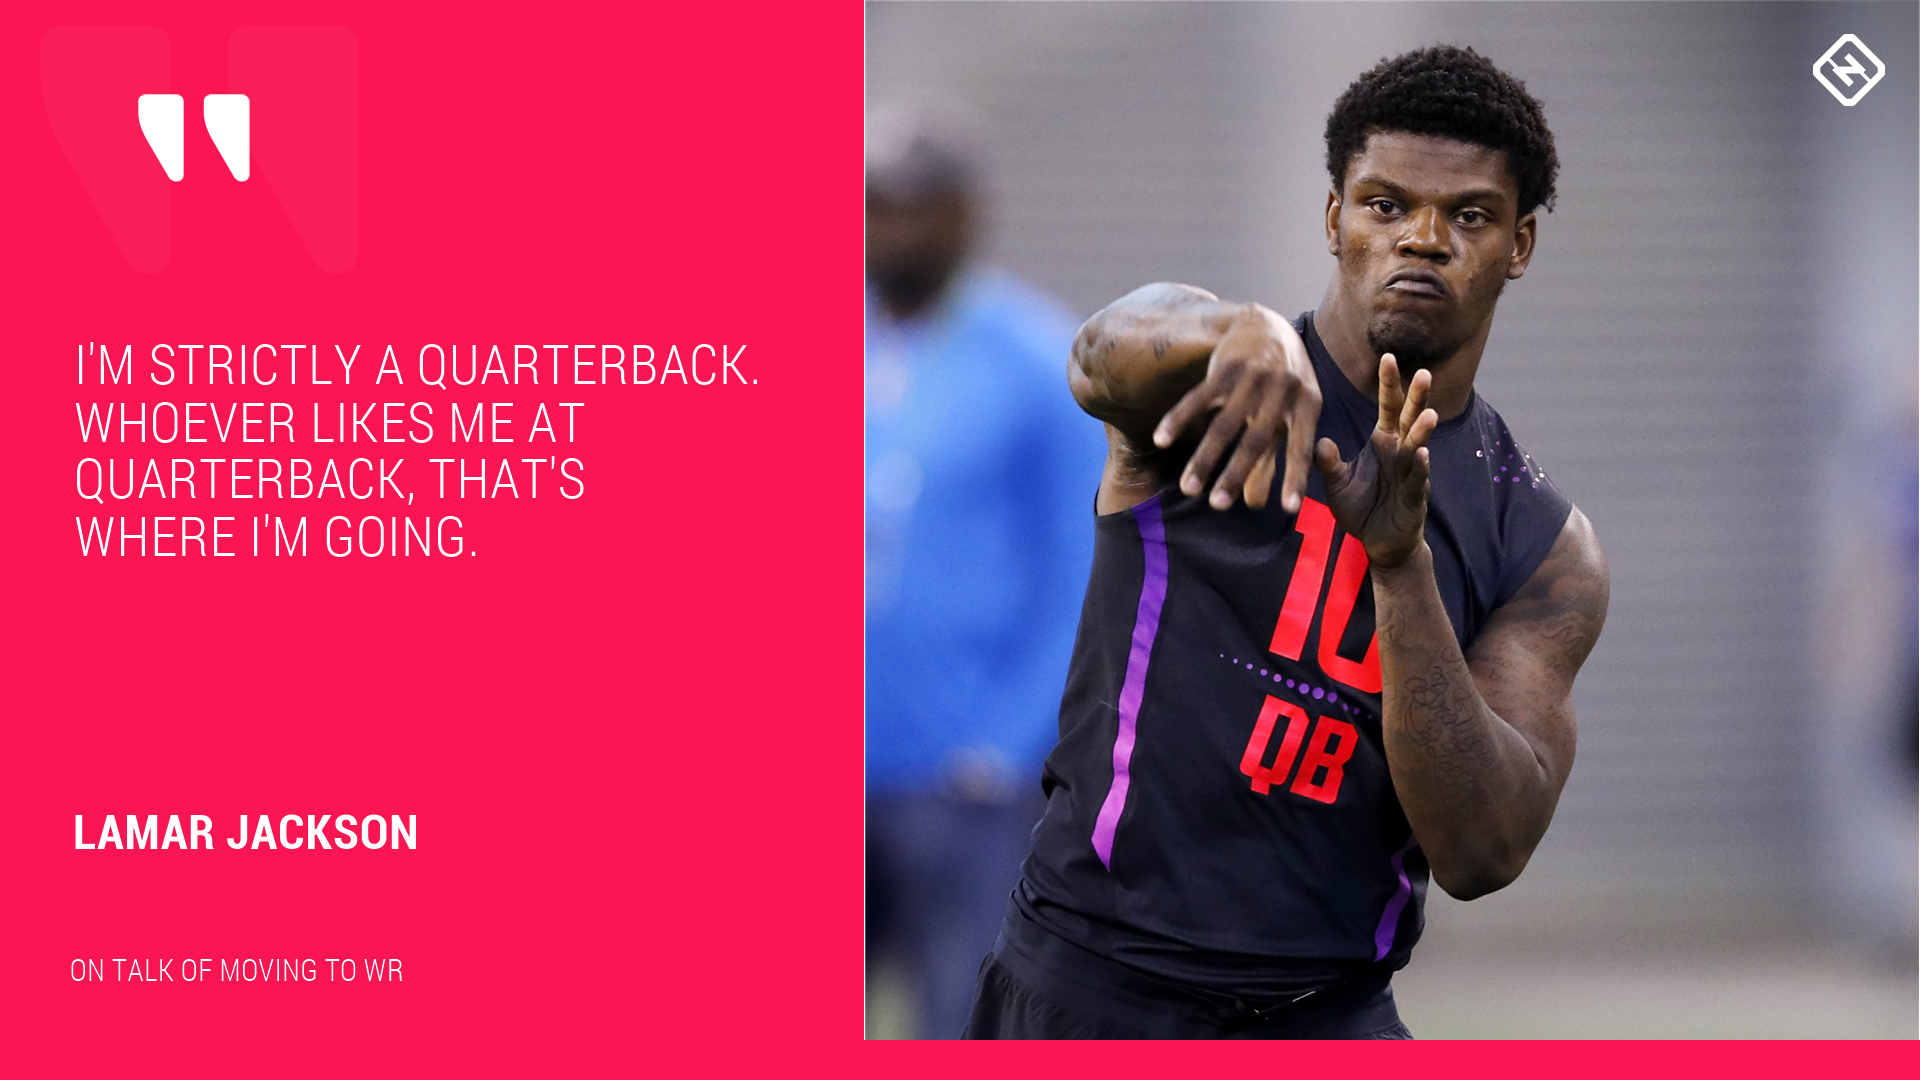 Lamar Jackson at WR? Louisville QB shoots down talk of switch